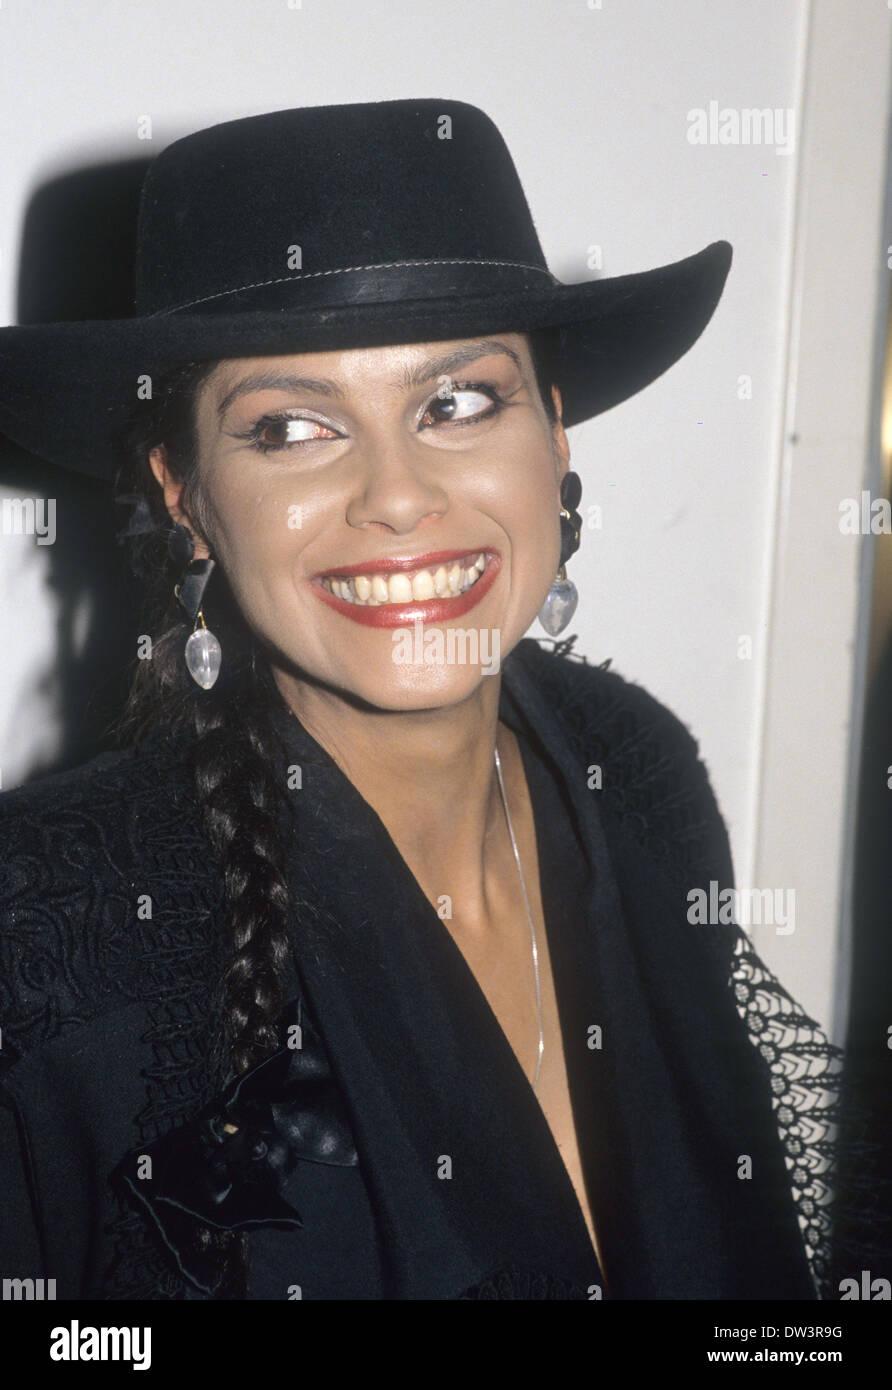 VANITY - Denise Matthews - Canadian pop singer about 1985 ...  Vanity Singer Today